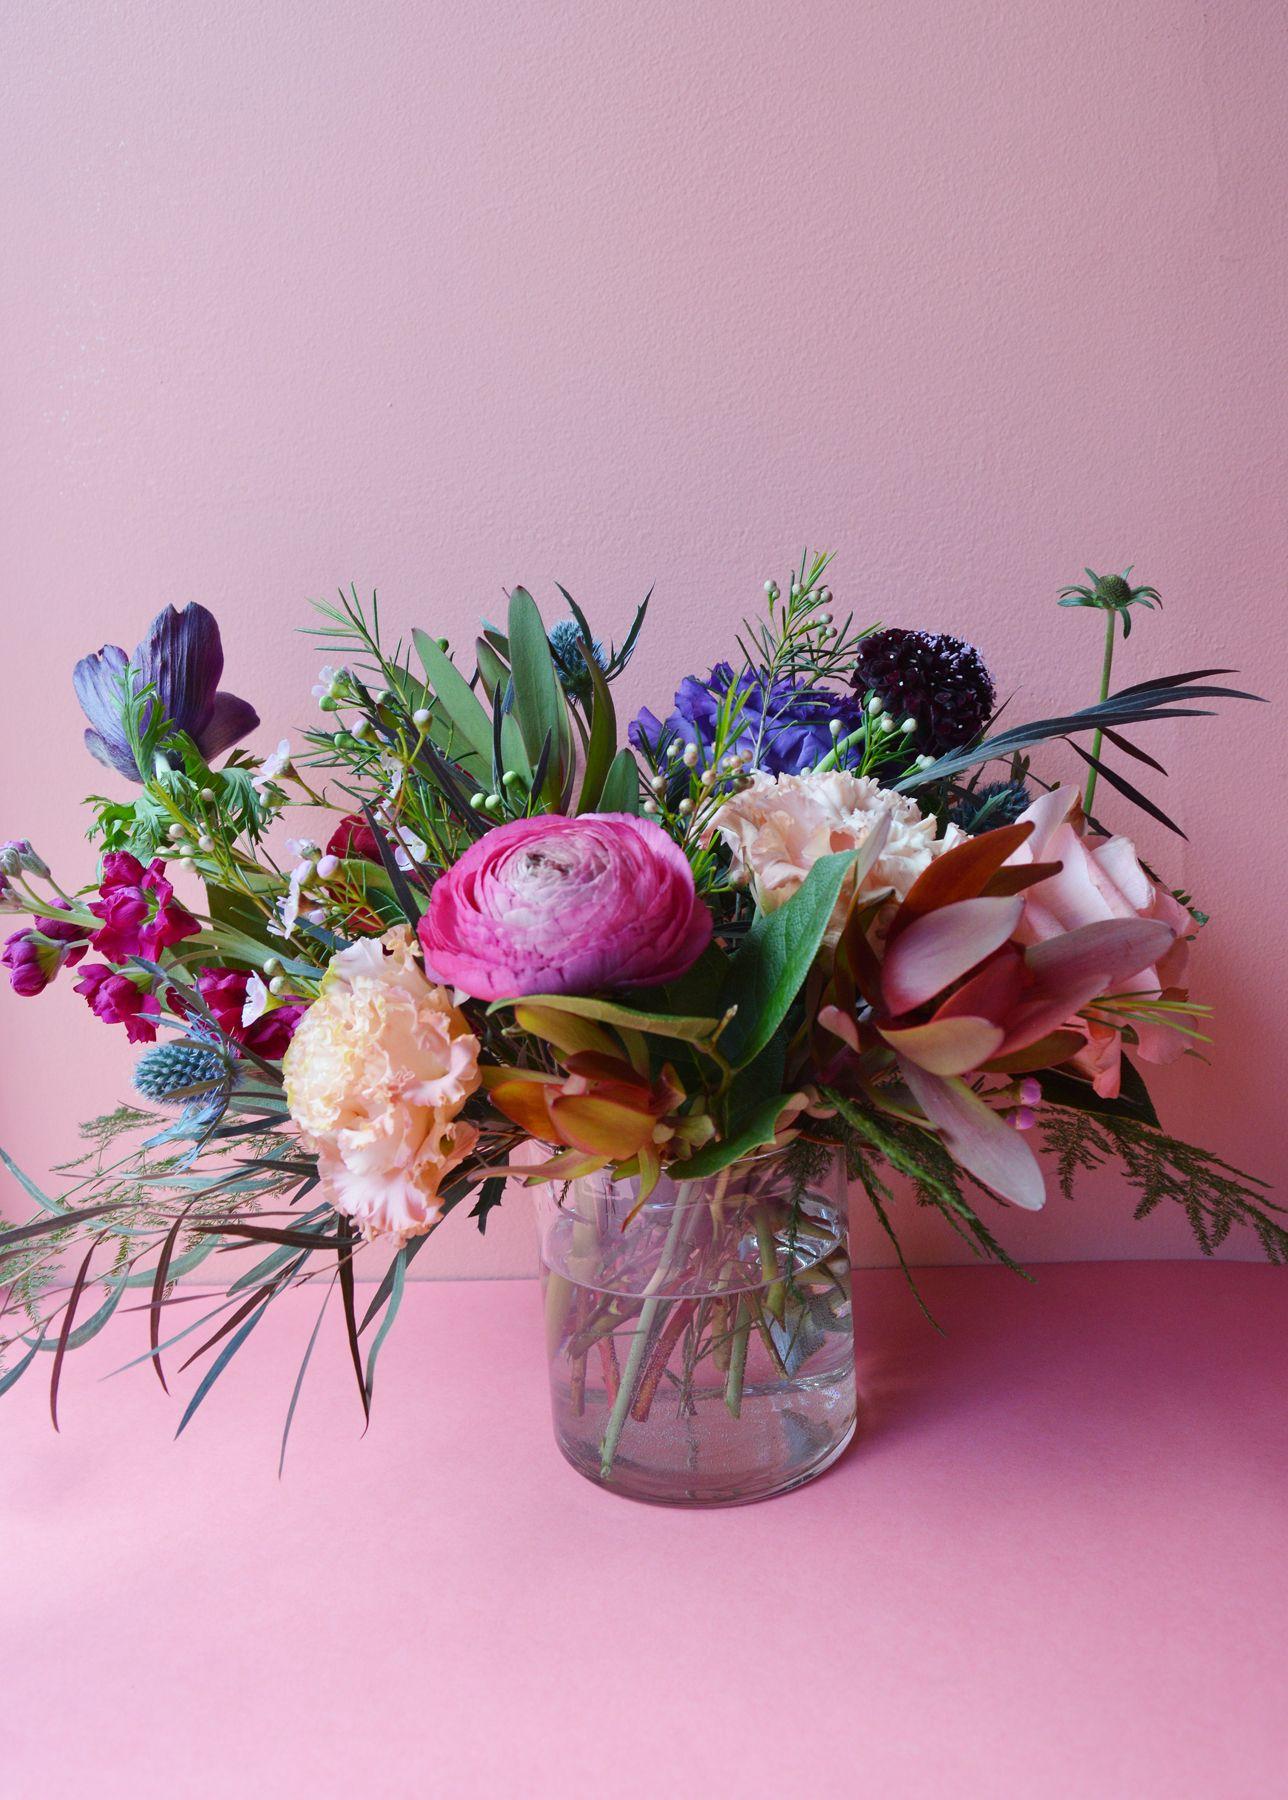 Beautiful table arrangement featuring ranunculus thistles